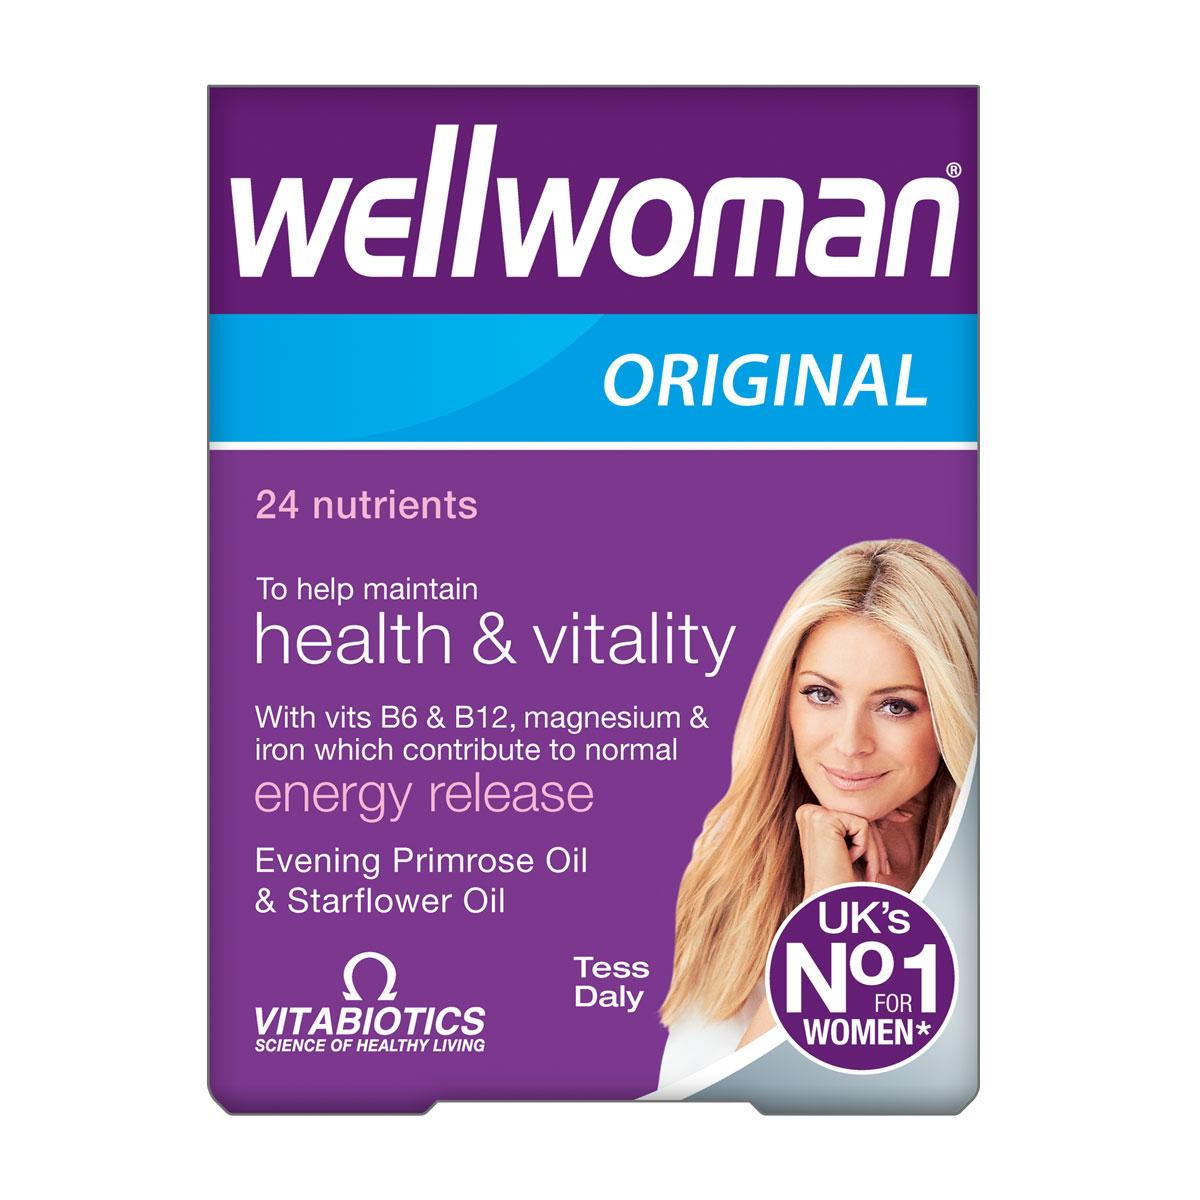 Wellwoman Original